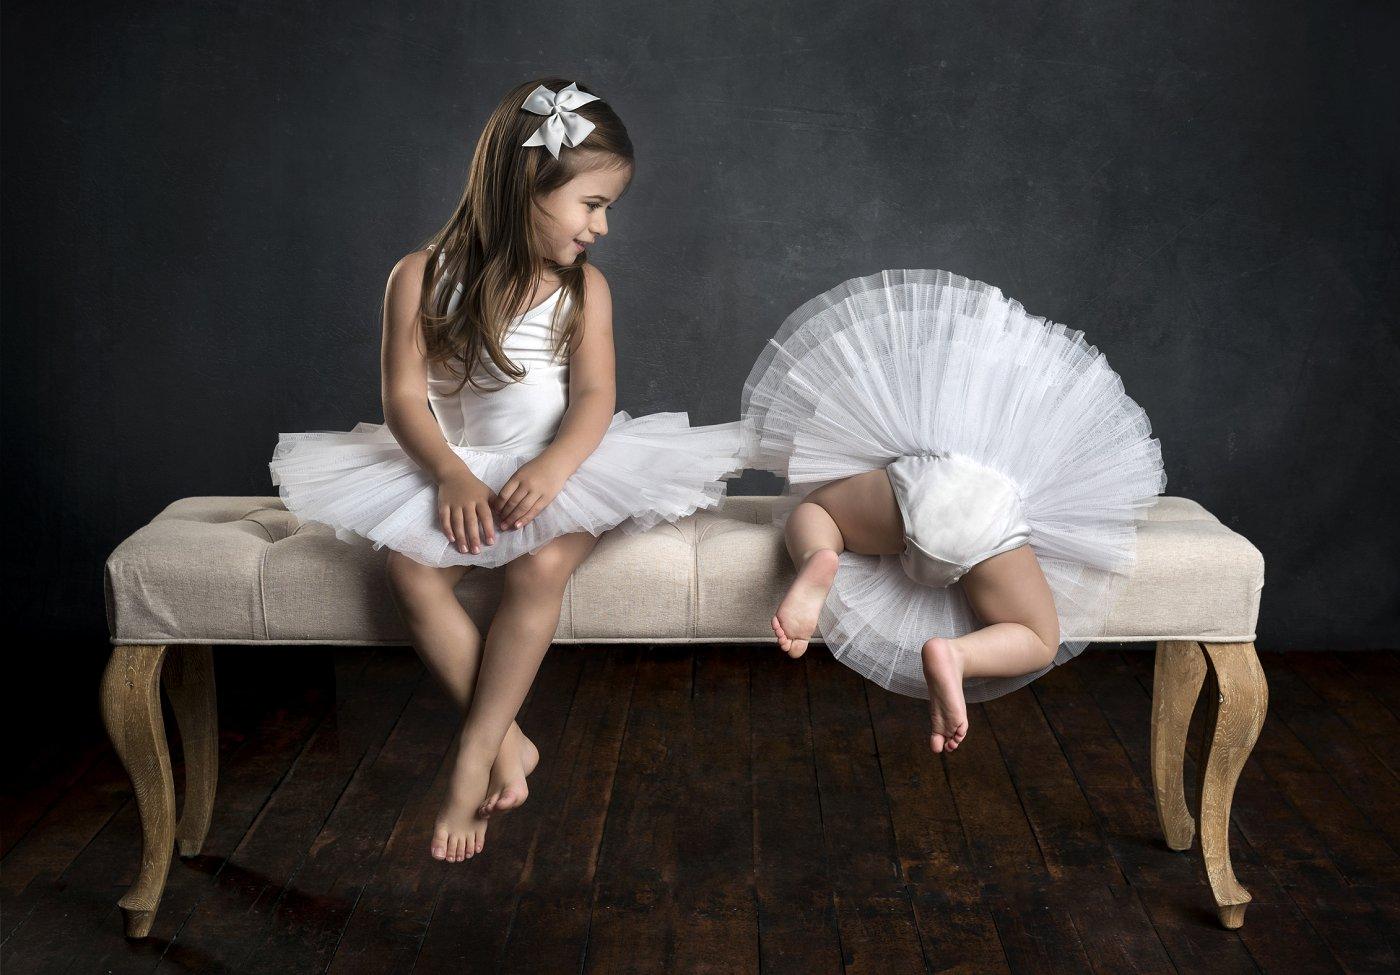 ballet-photographer-sydney (2).jpg